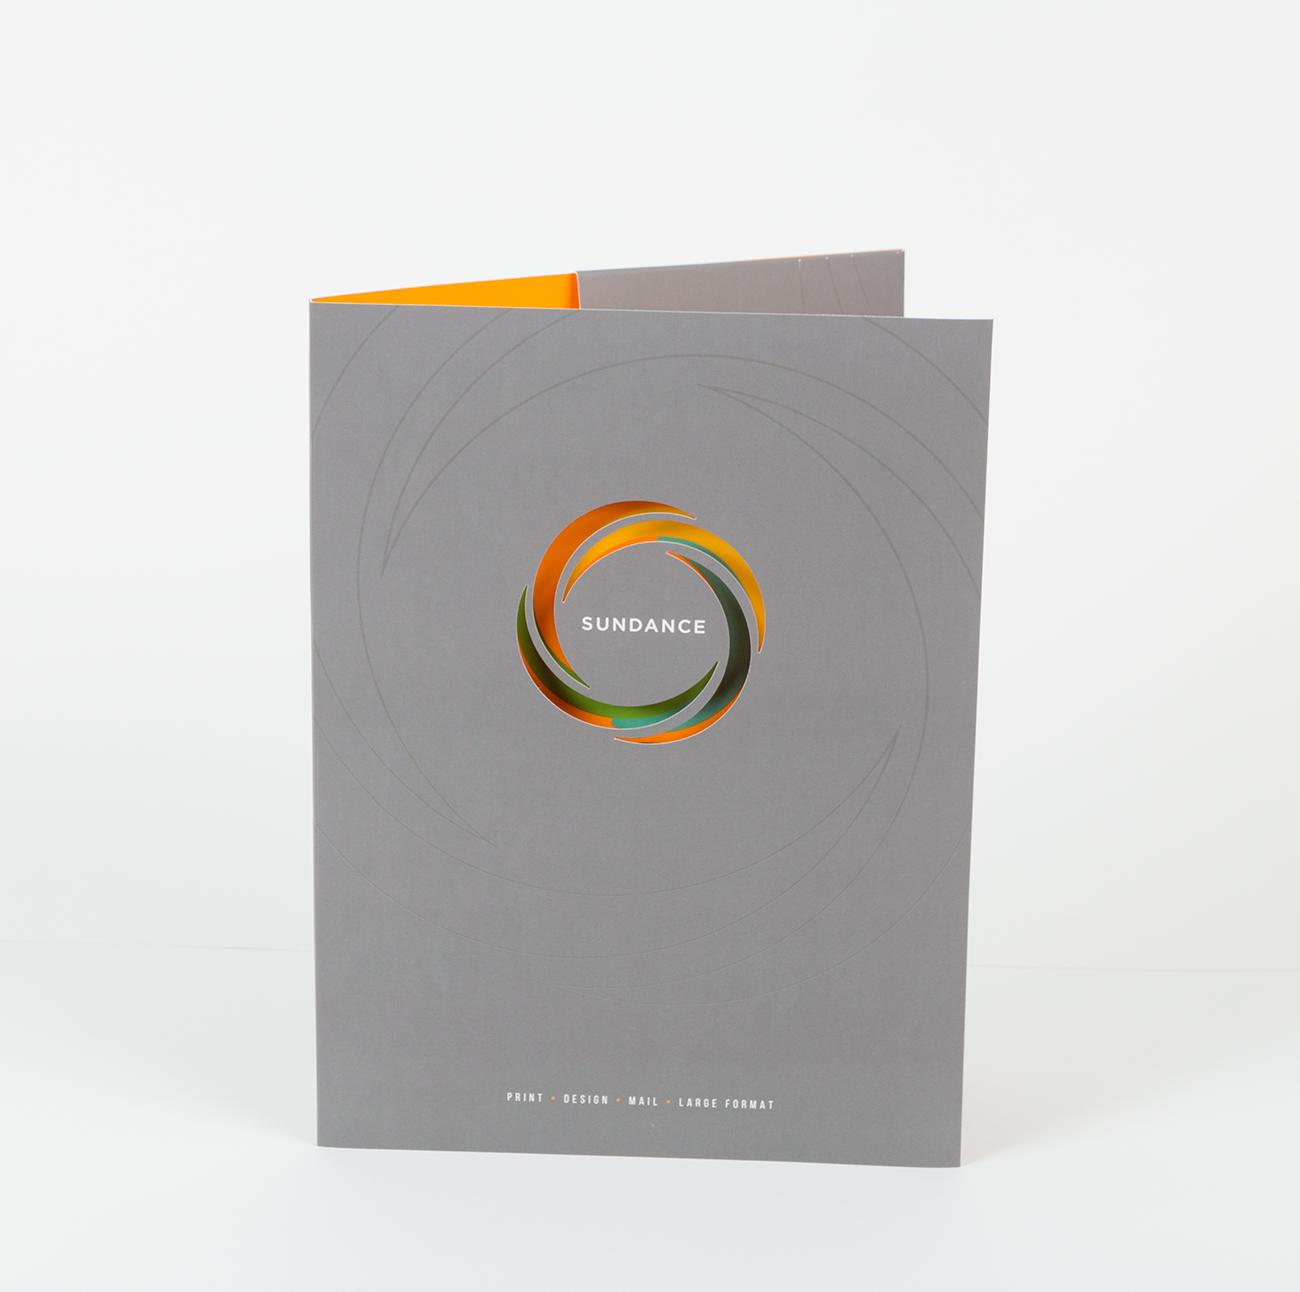 Video - SunDance Creative Featured Again on 60 Second Fold